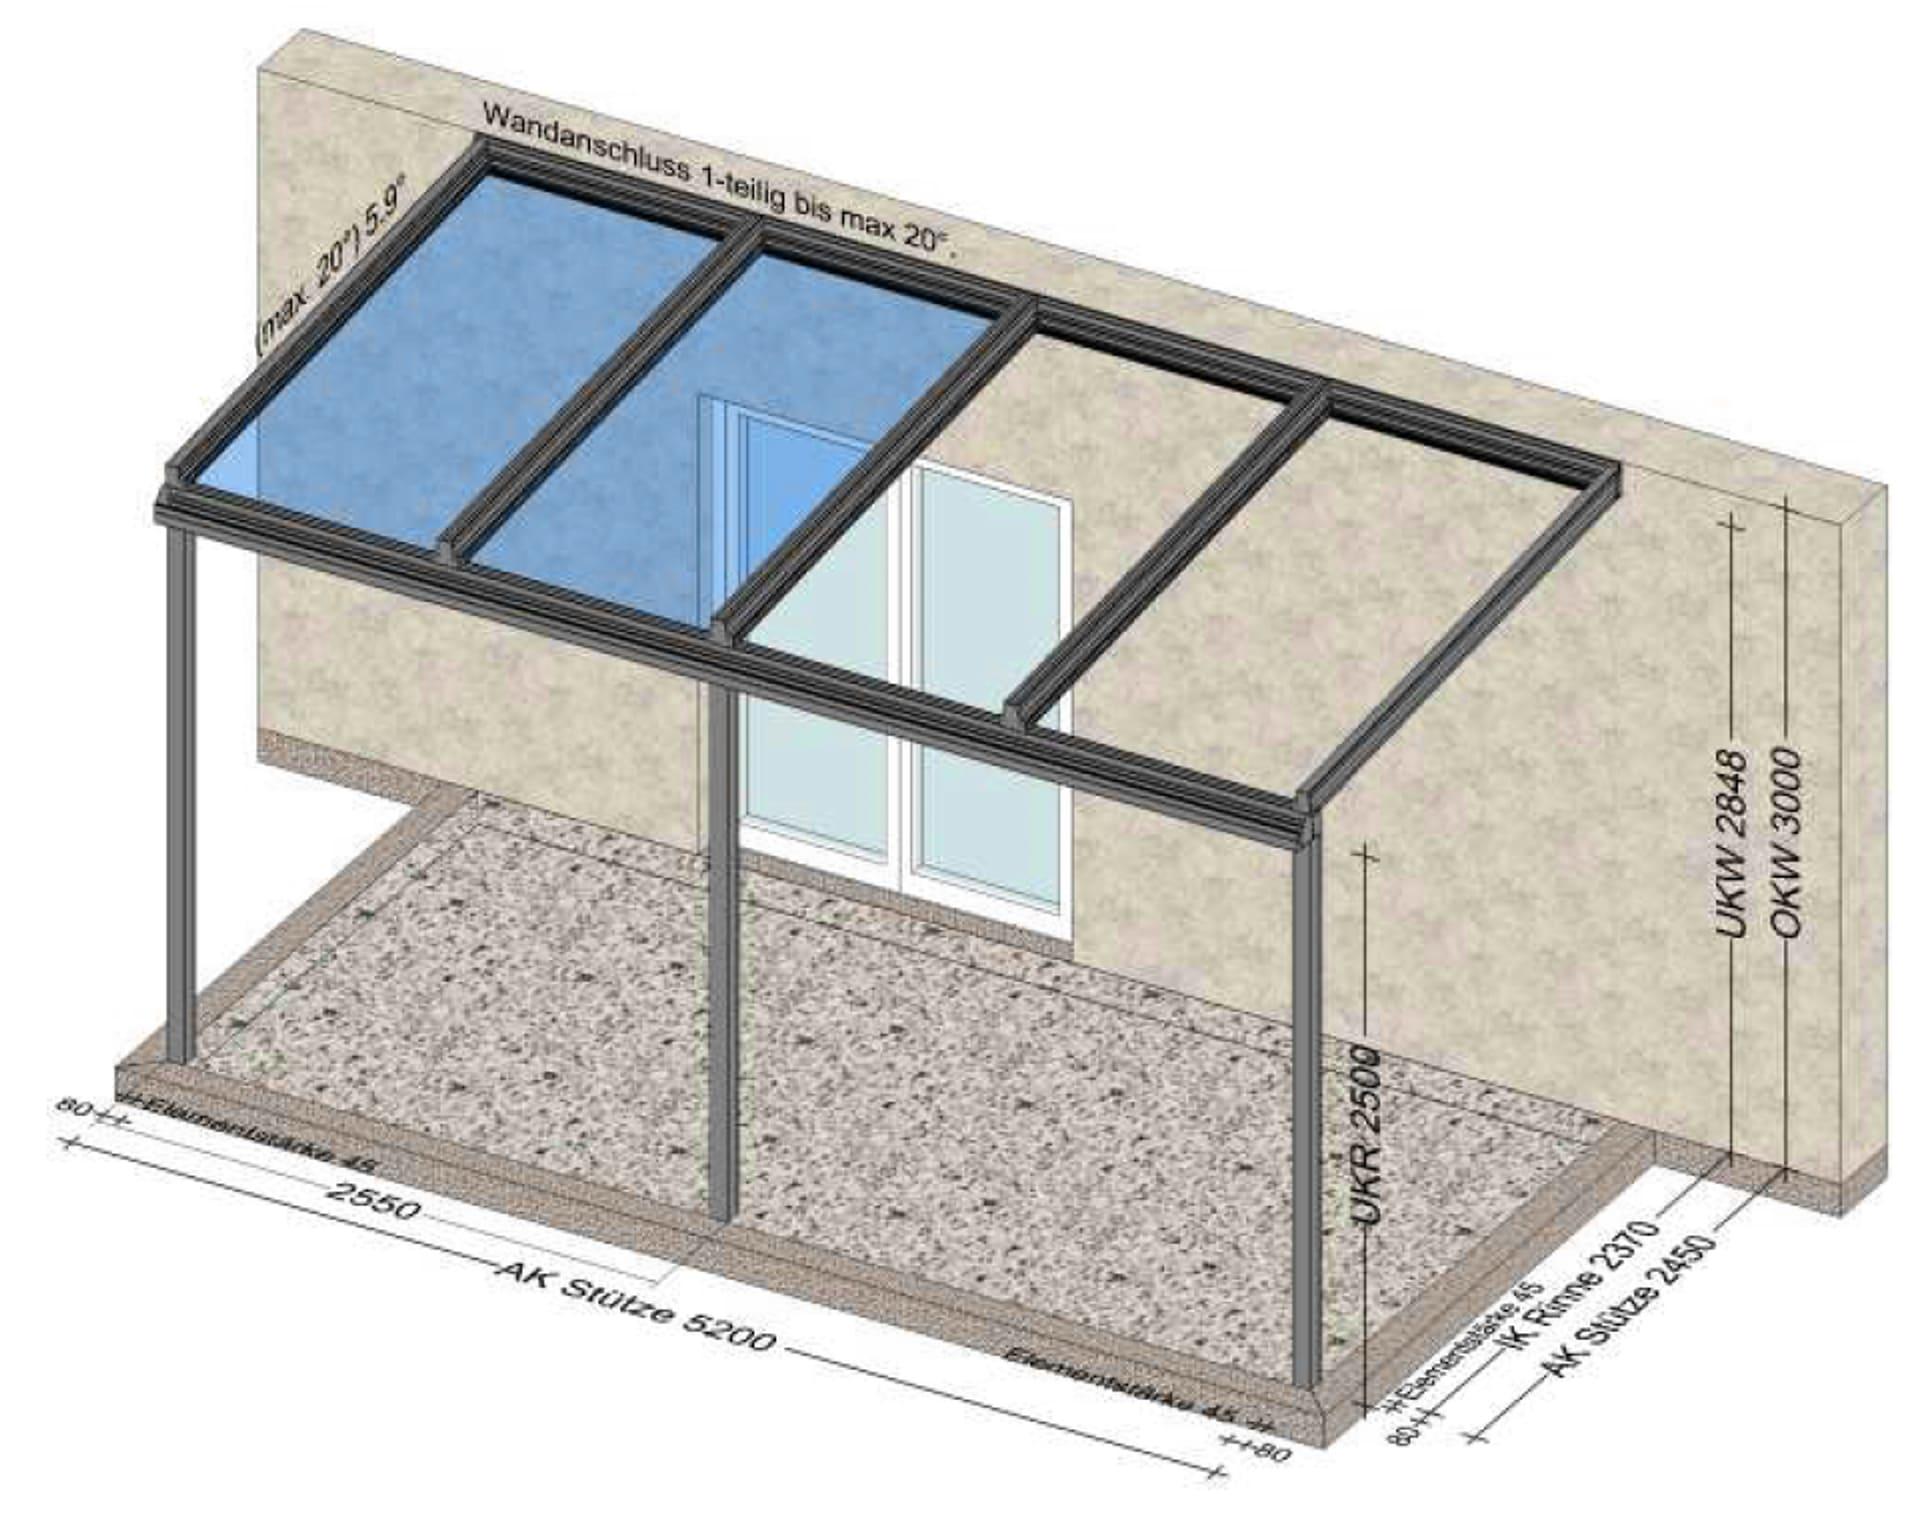 Terrassenüberdachung nur teilweise verglast - Planung